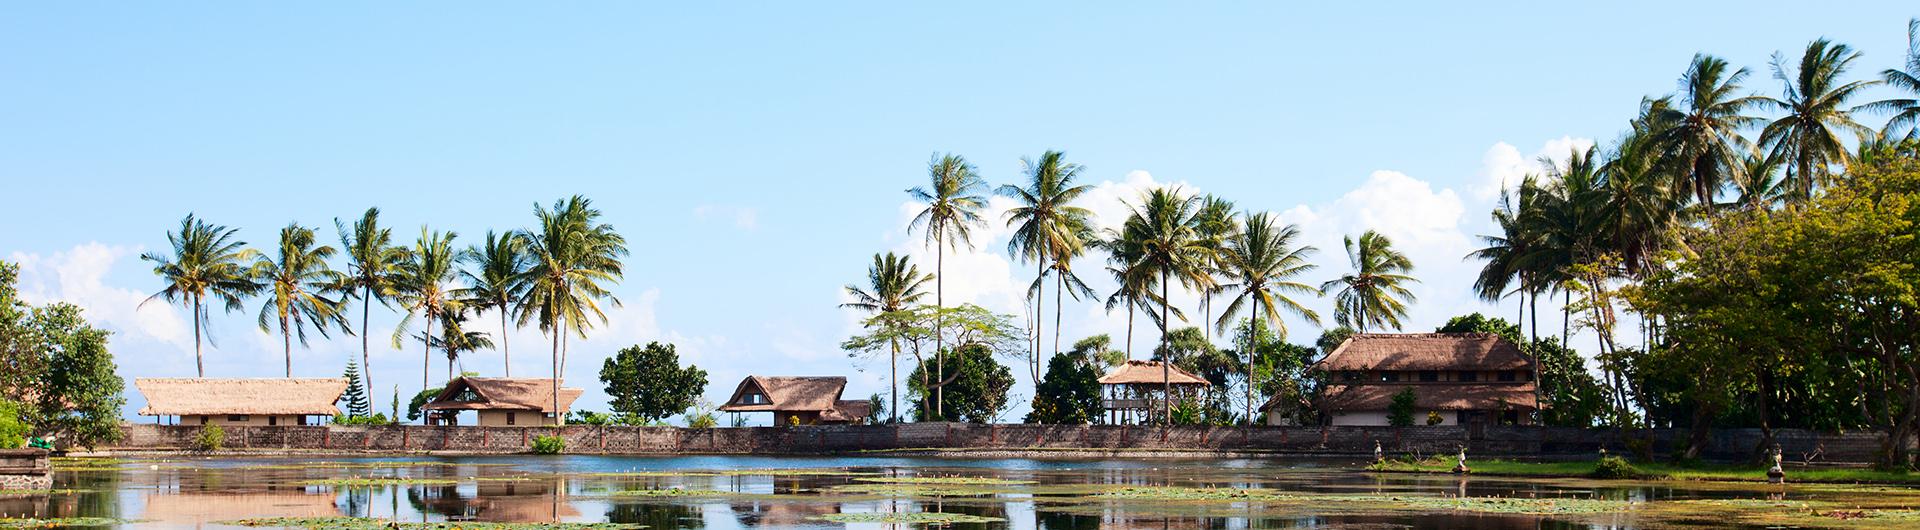 Alcohol rehab in Bali set among beautiful lagoon landscape